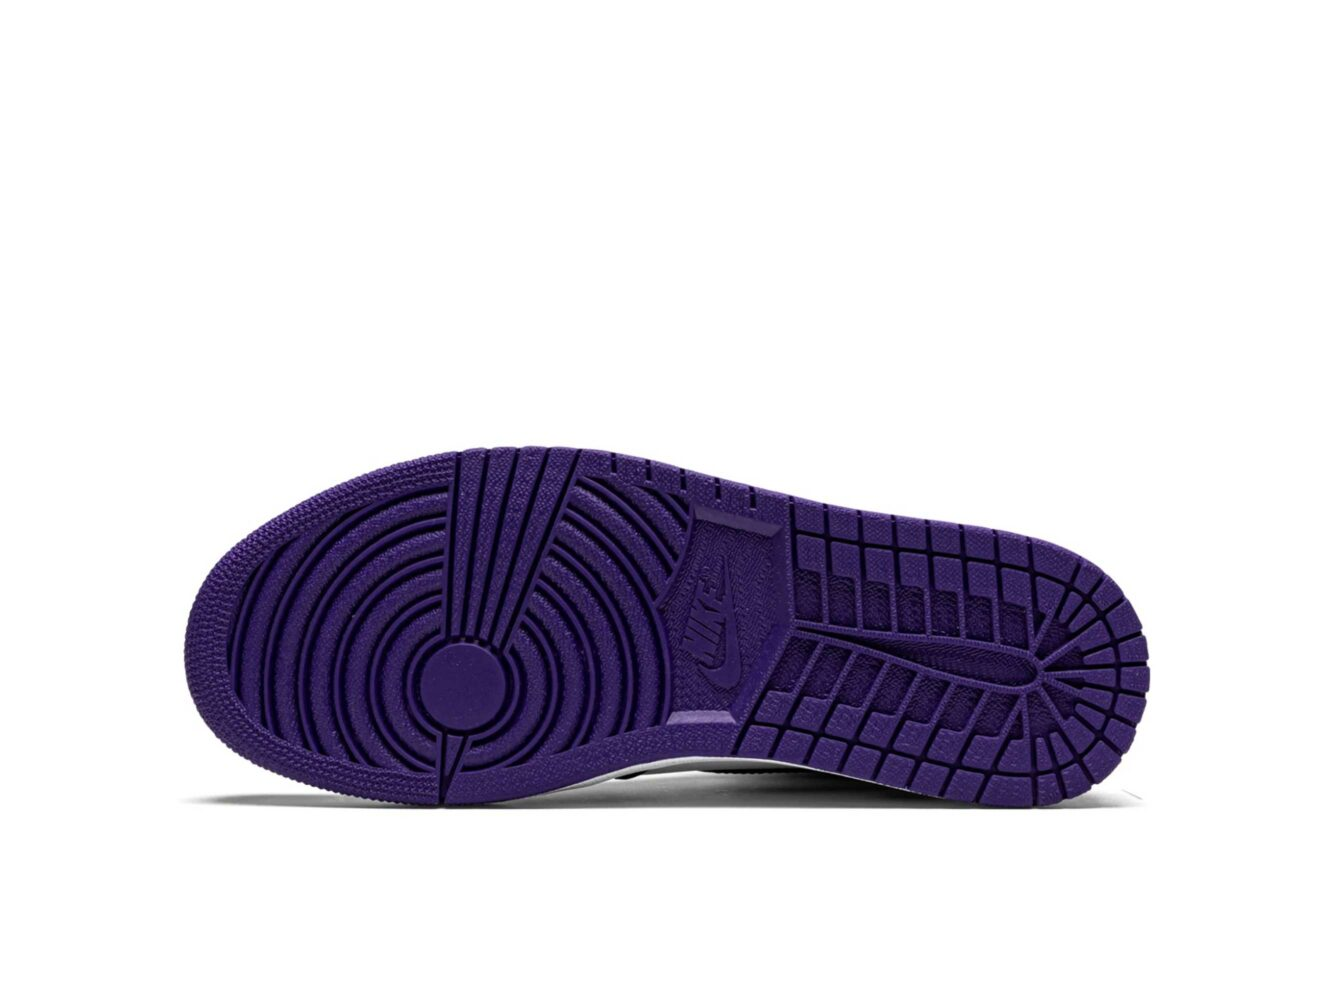 nike air Jordan 1 retro mid court purple 575441_501 купить